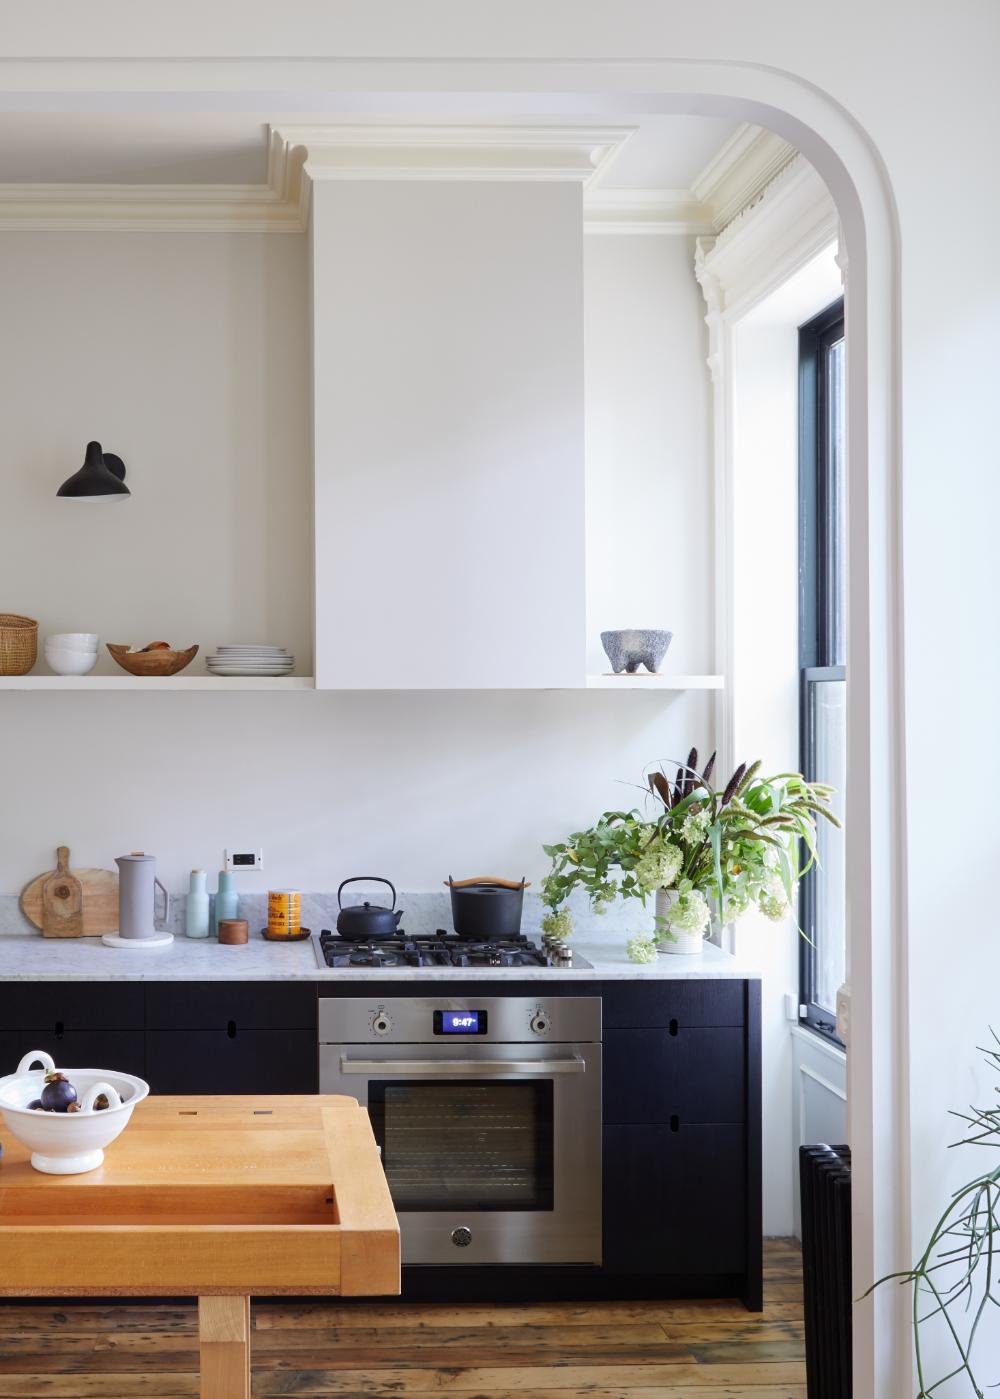 Small Streamlined Brooklyn Kitchen With Black Cabinets By Architect Jess Thomas Black Kitchen Cabinets Open Kitchen Shelves Brooklyn Kitchen